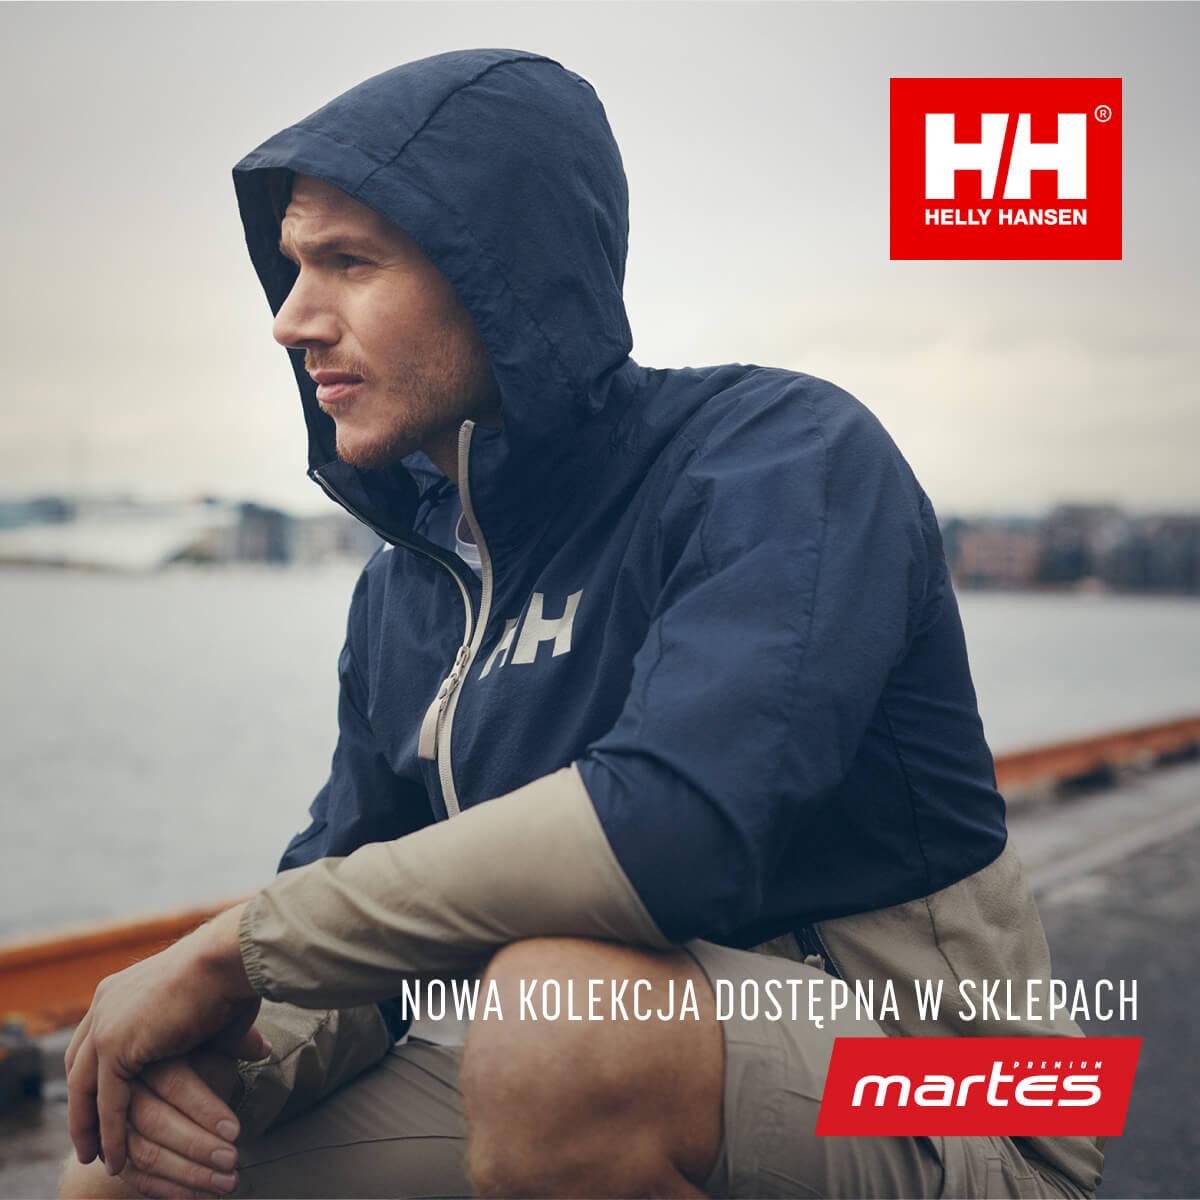 Nowa kolekcja Helly Hansen wMartes Sport!